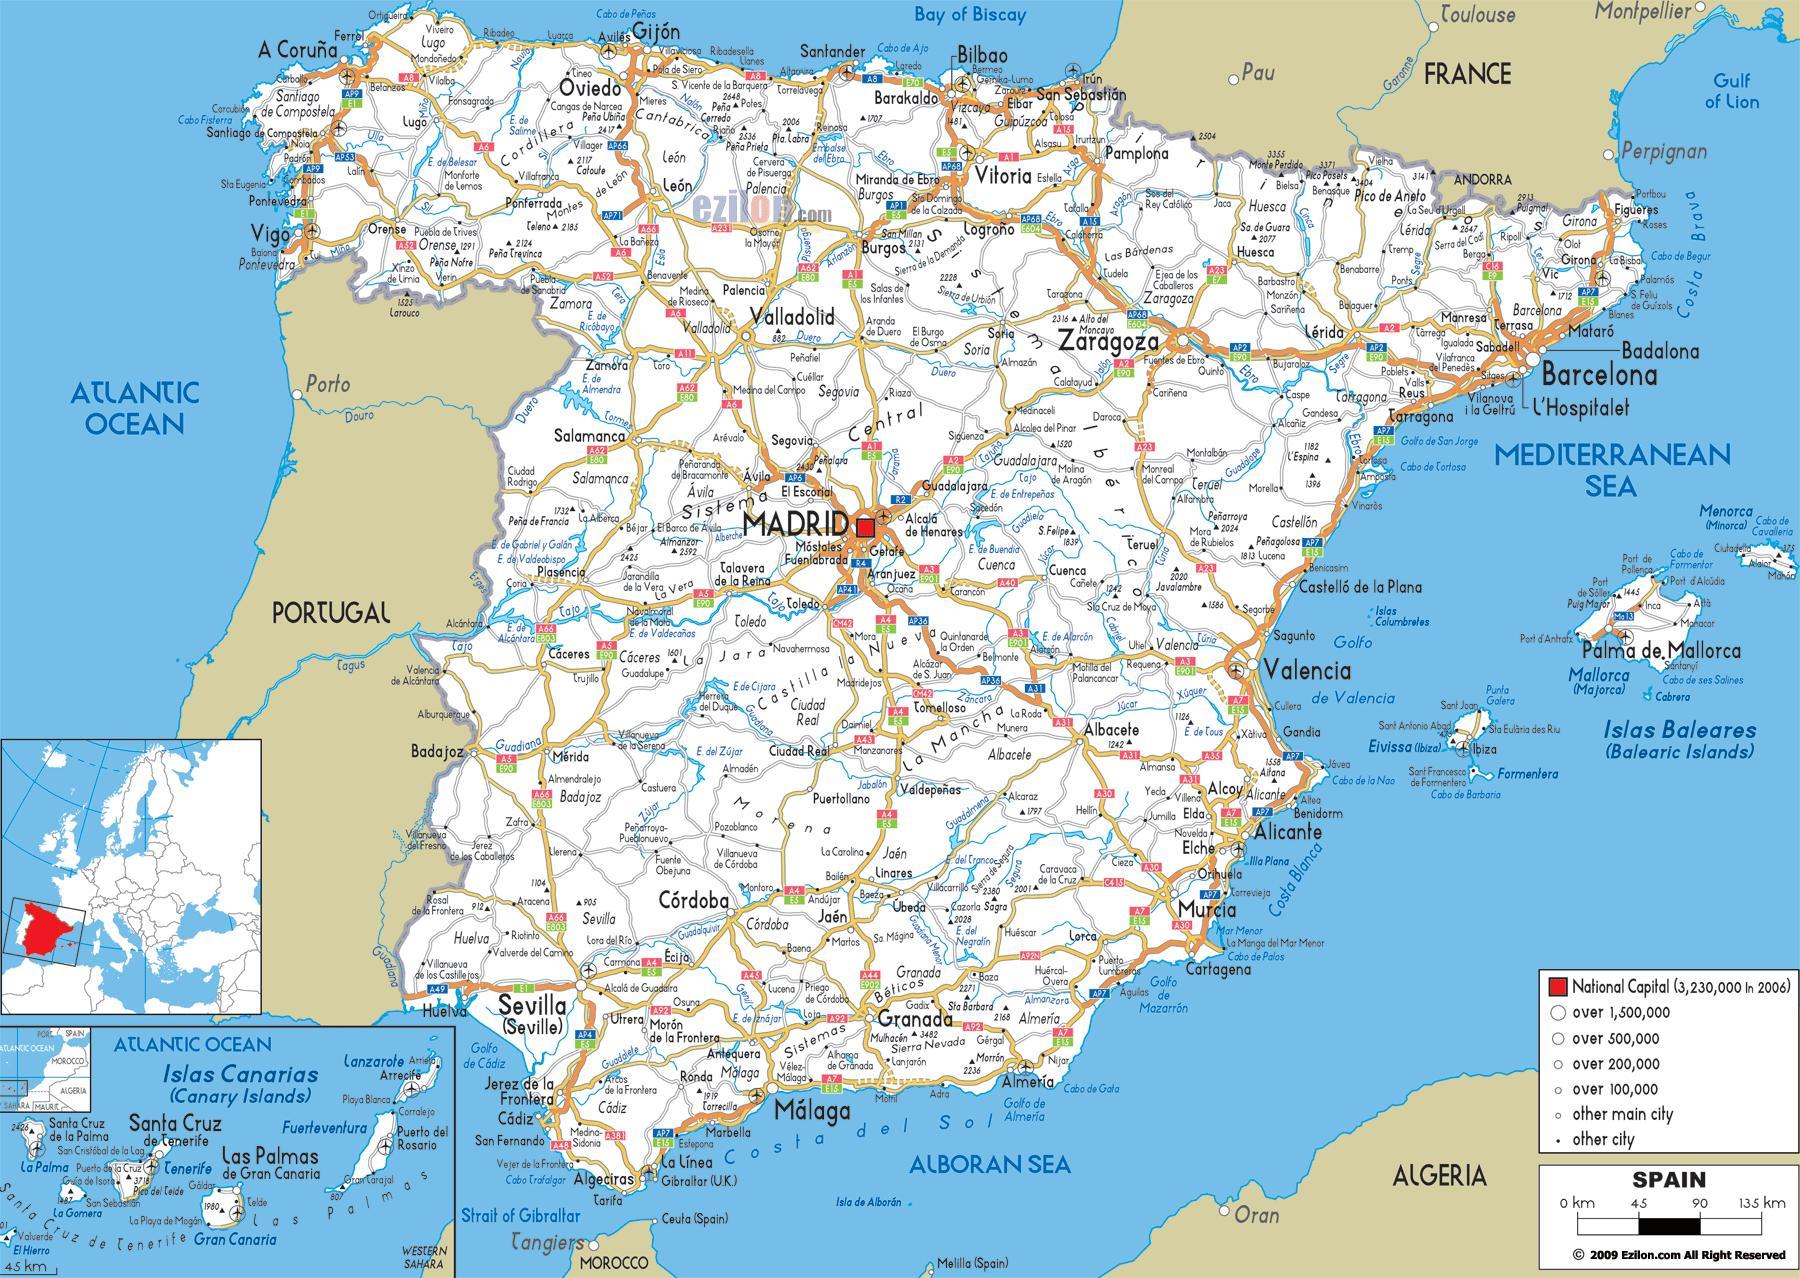 Spagna Nord Cartina.Guida Mappa Di Spagna Cartina Della Spagna Di Guida Europa Del Sud Europa